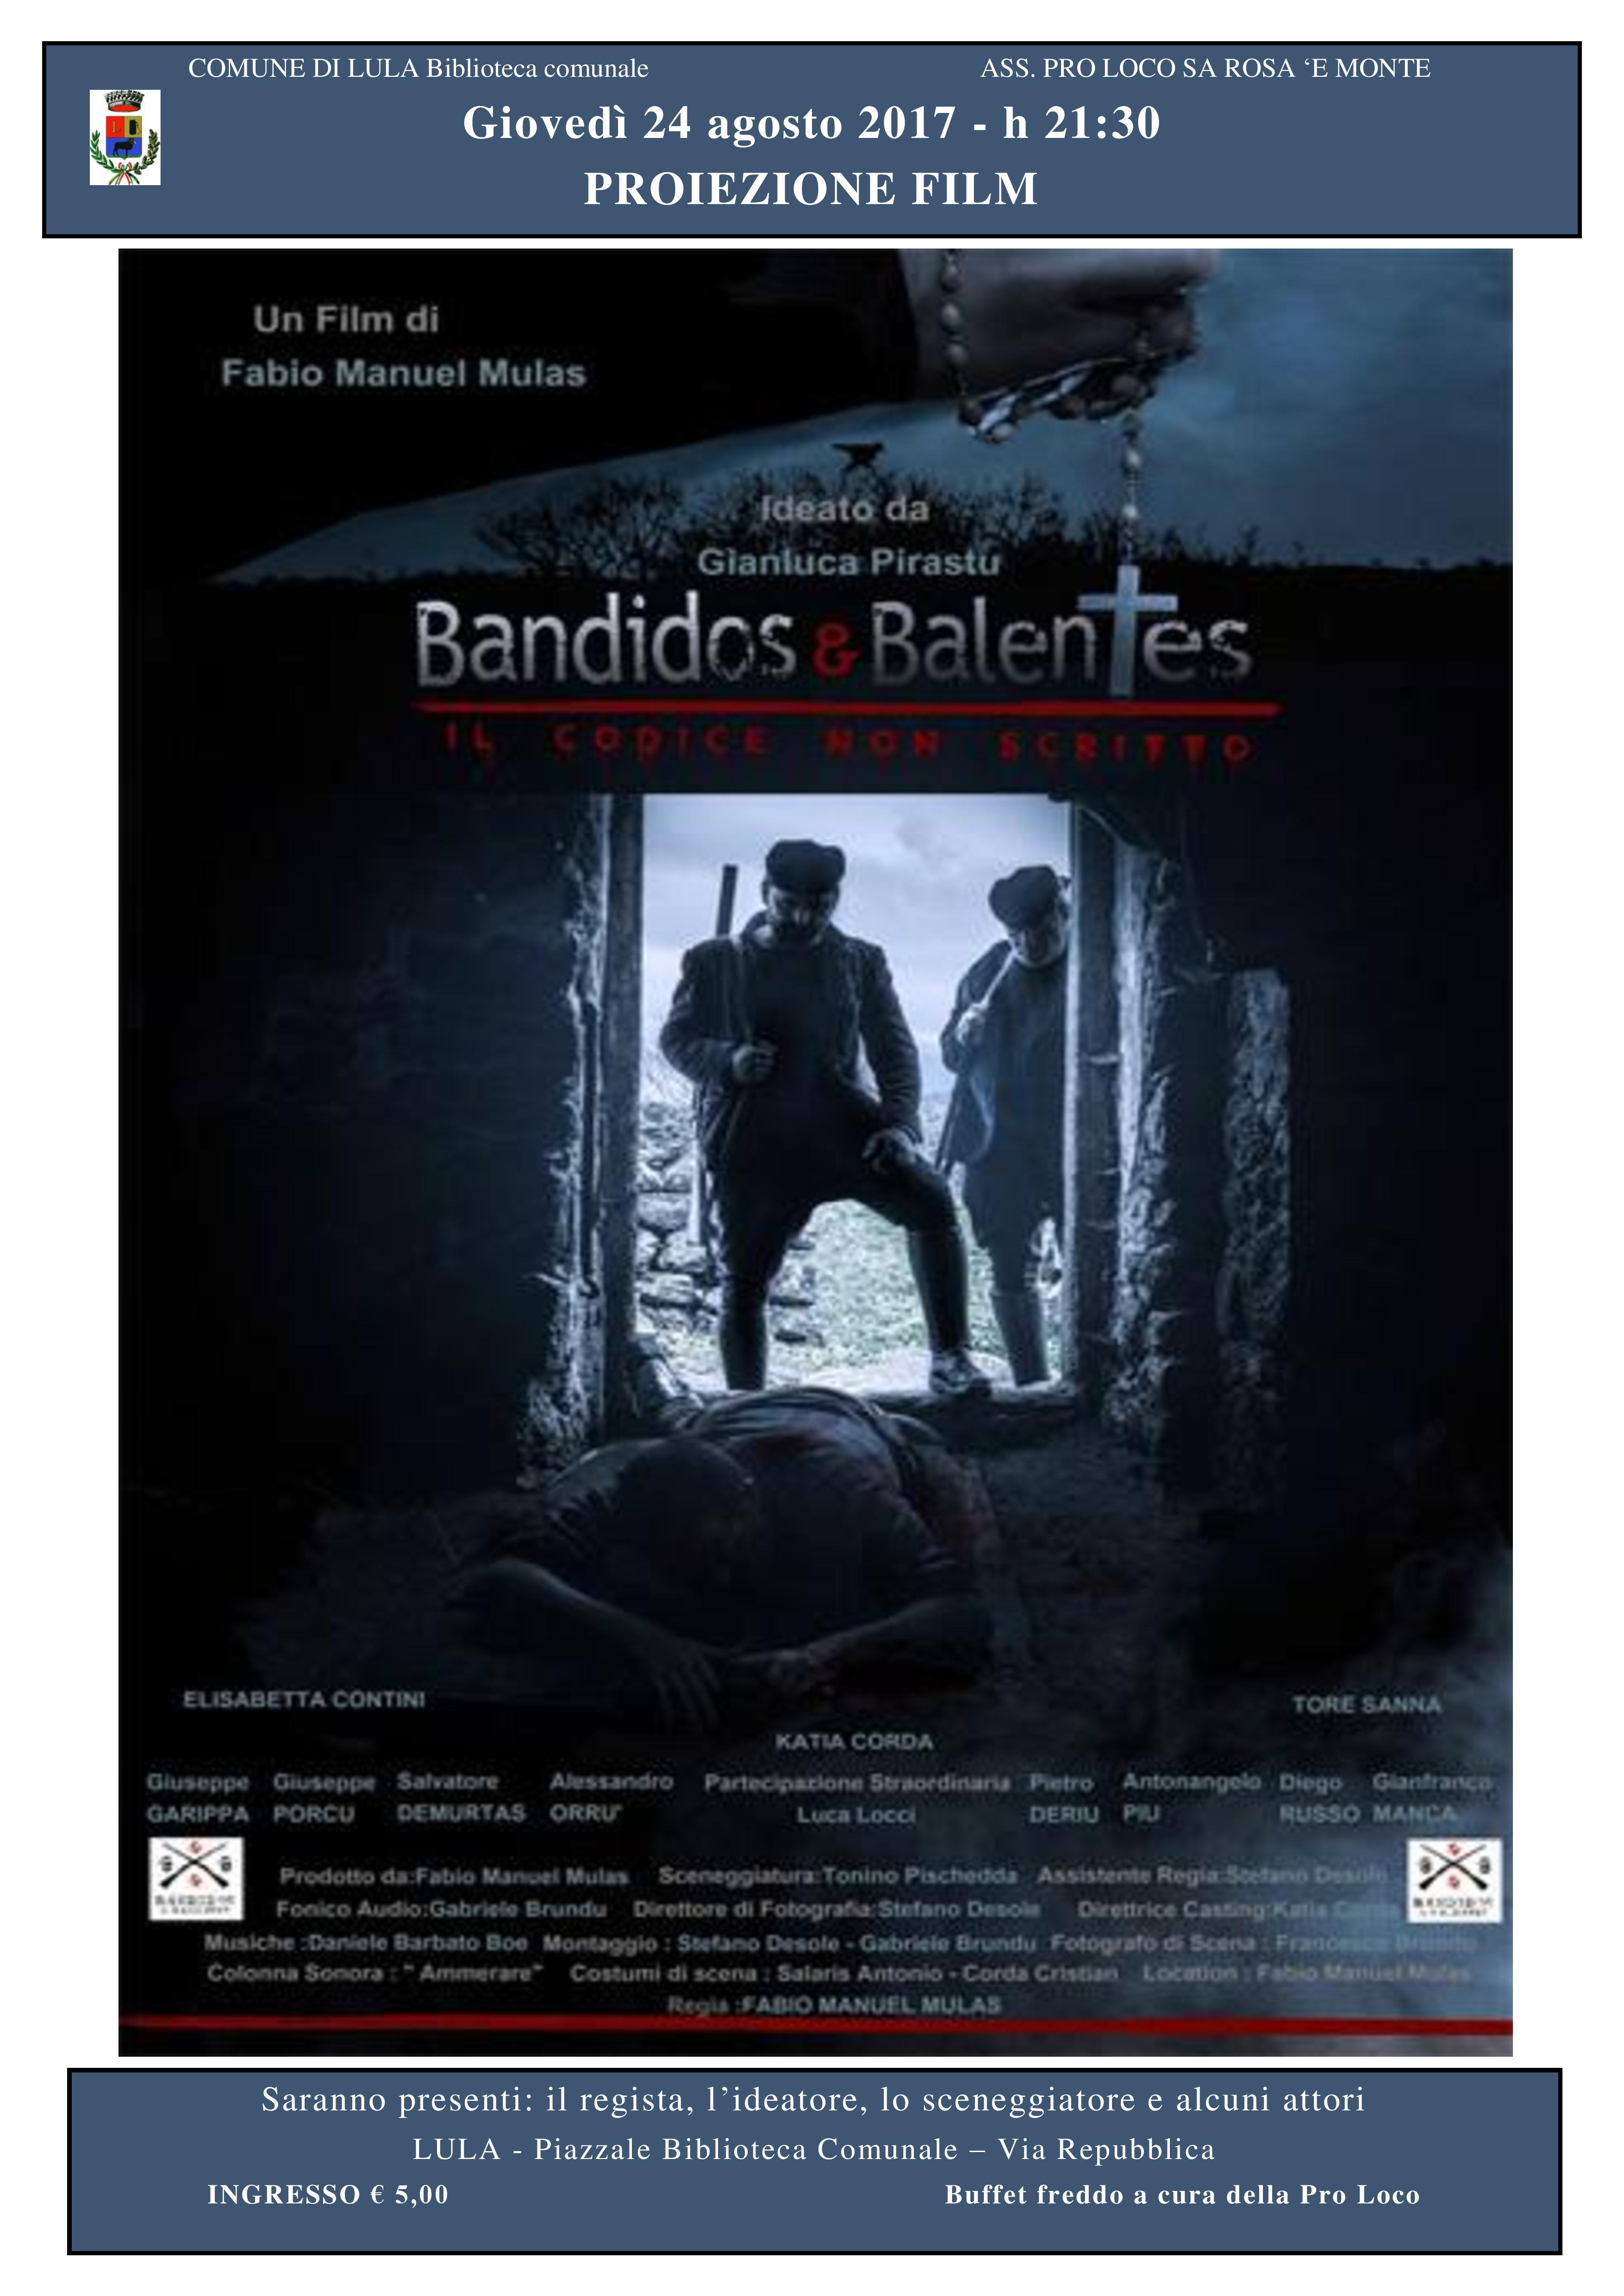 Proiezione film 'Bandidos & Balentes' di Fabio Manuel Mulas